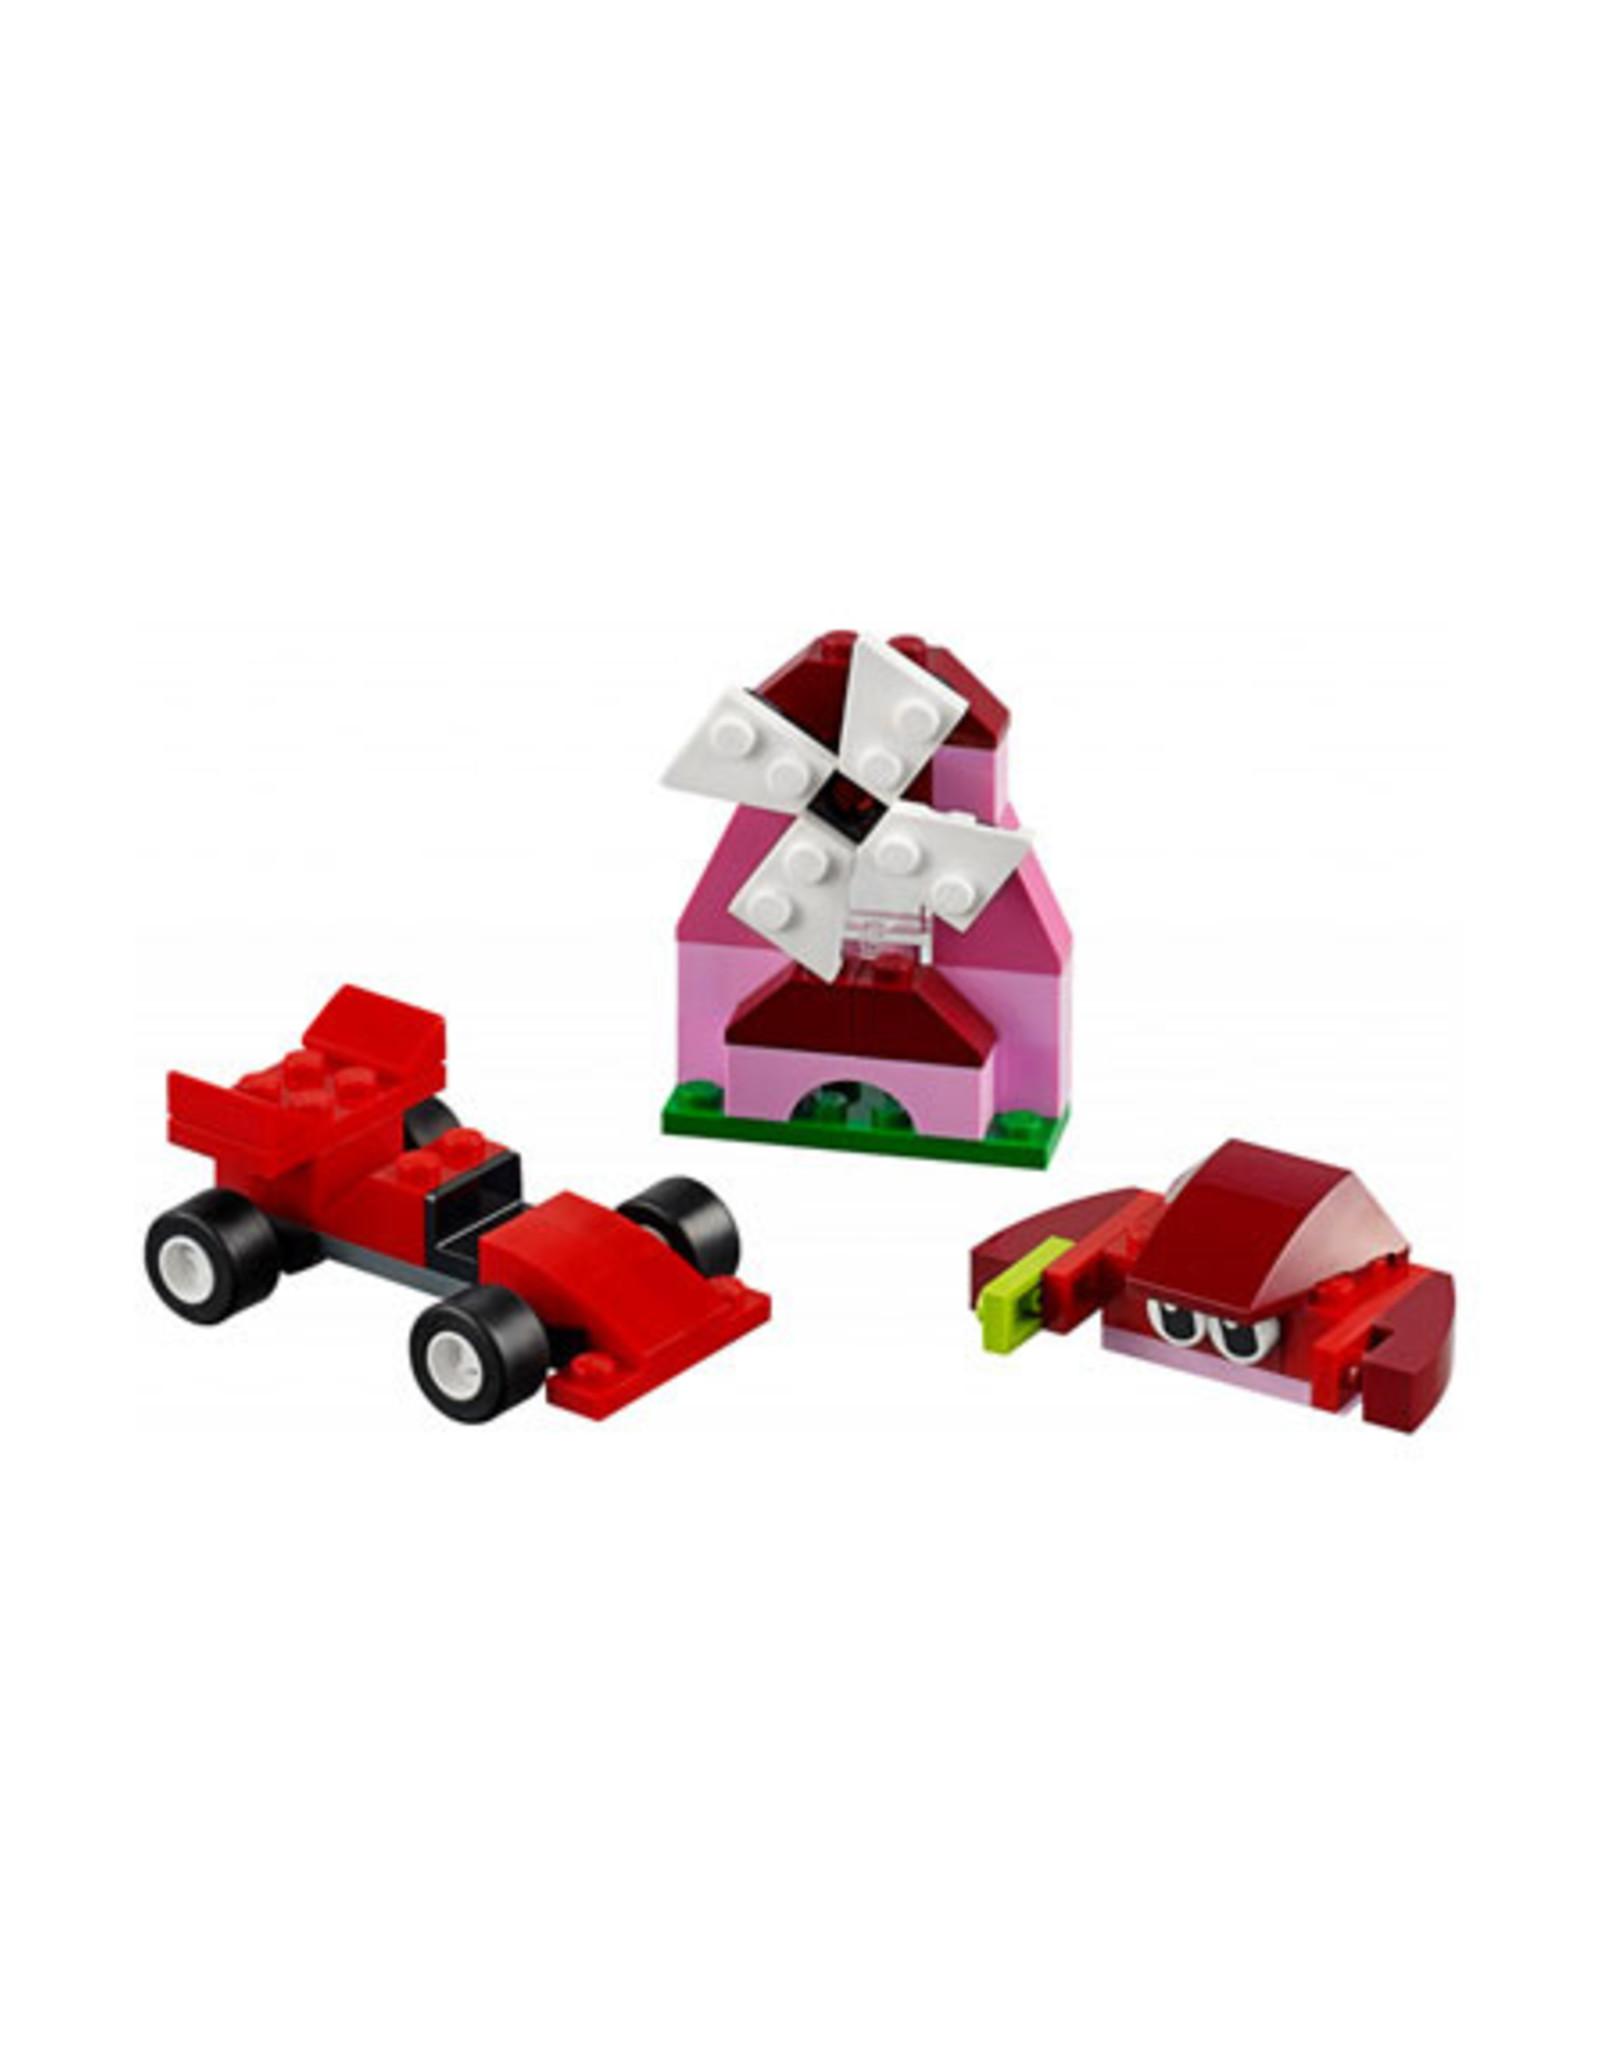 LEGO LEGO 10707 Red Creativity Box Classic